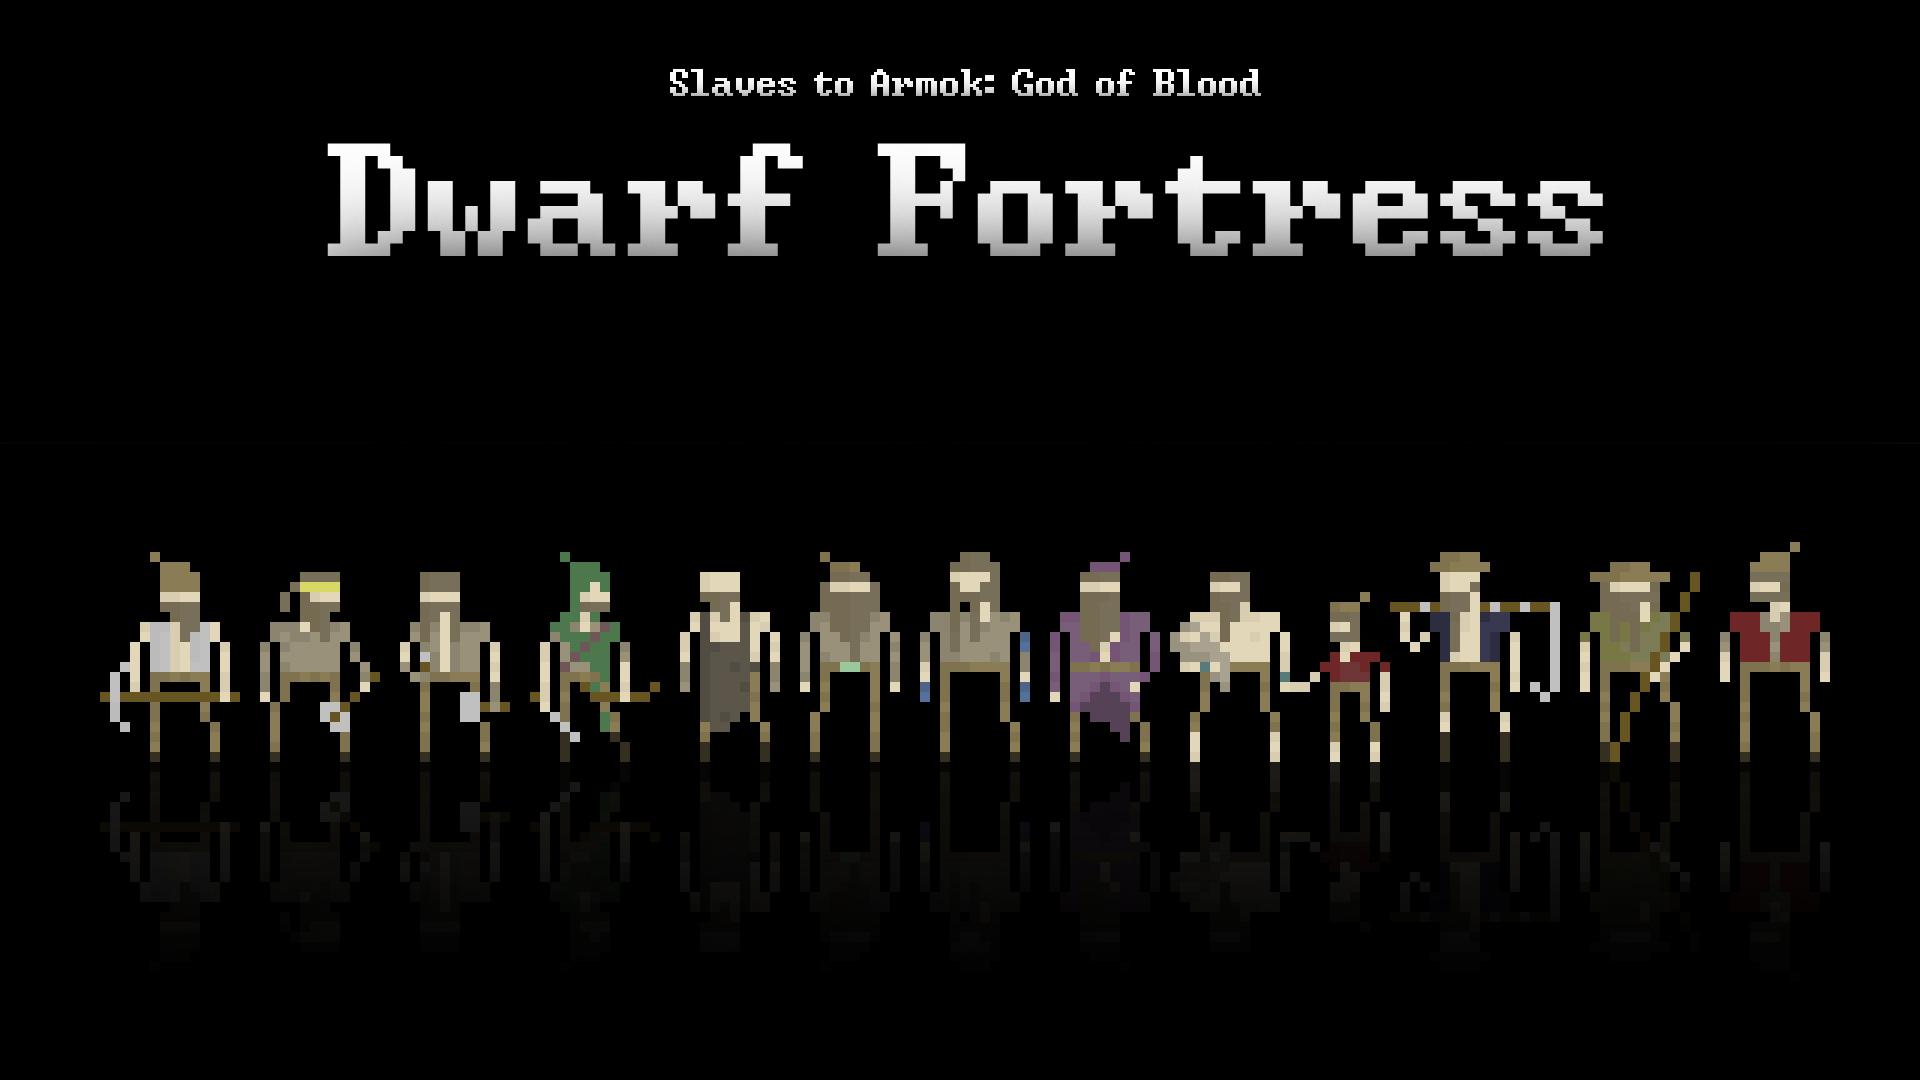 dwarf_fortress_lineout_by_izak1399-d54zrga